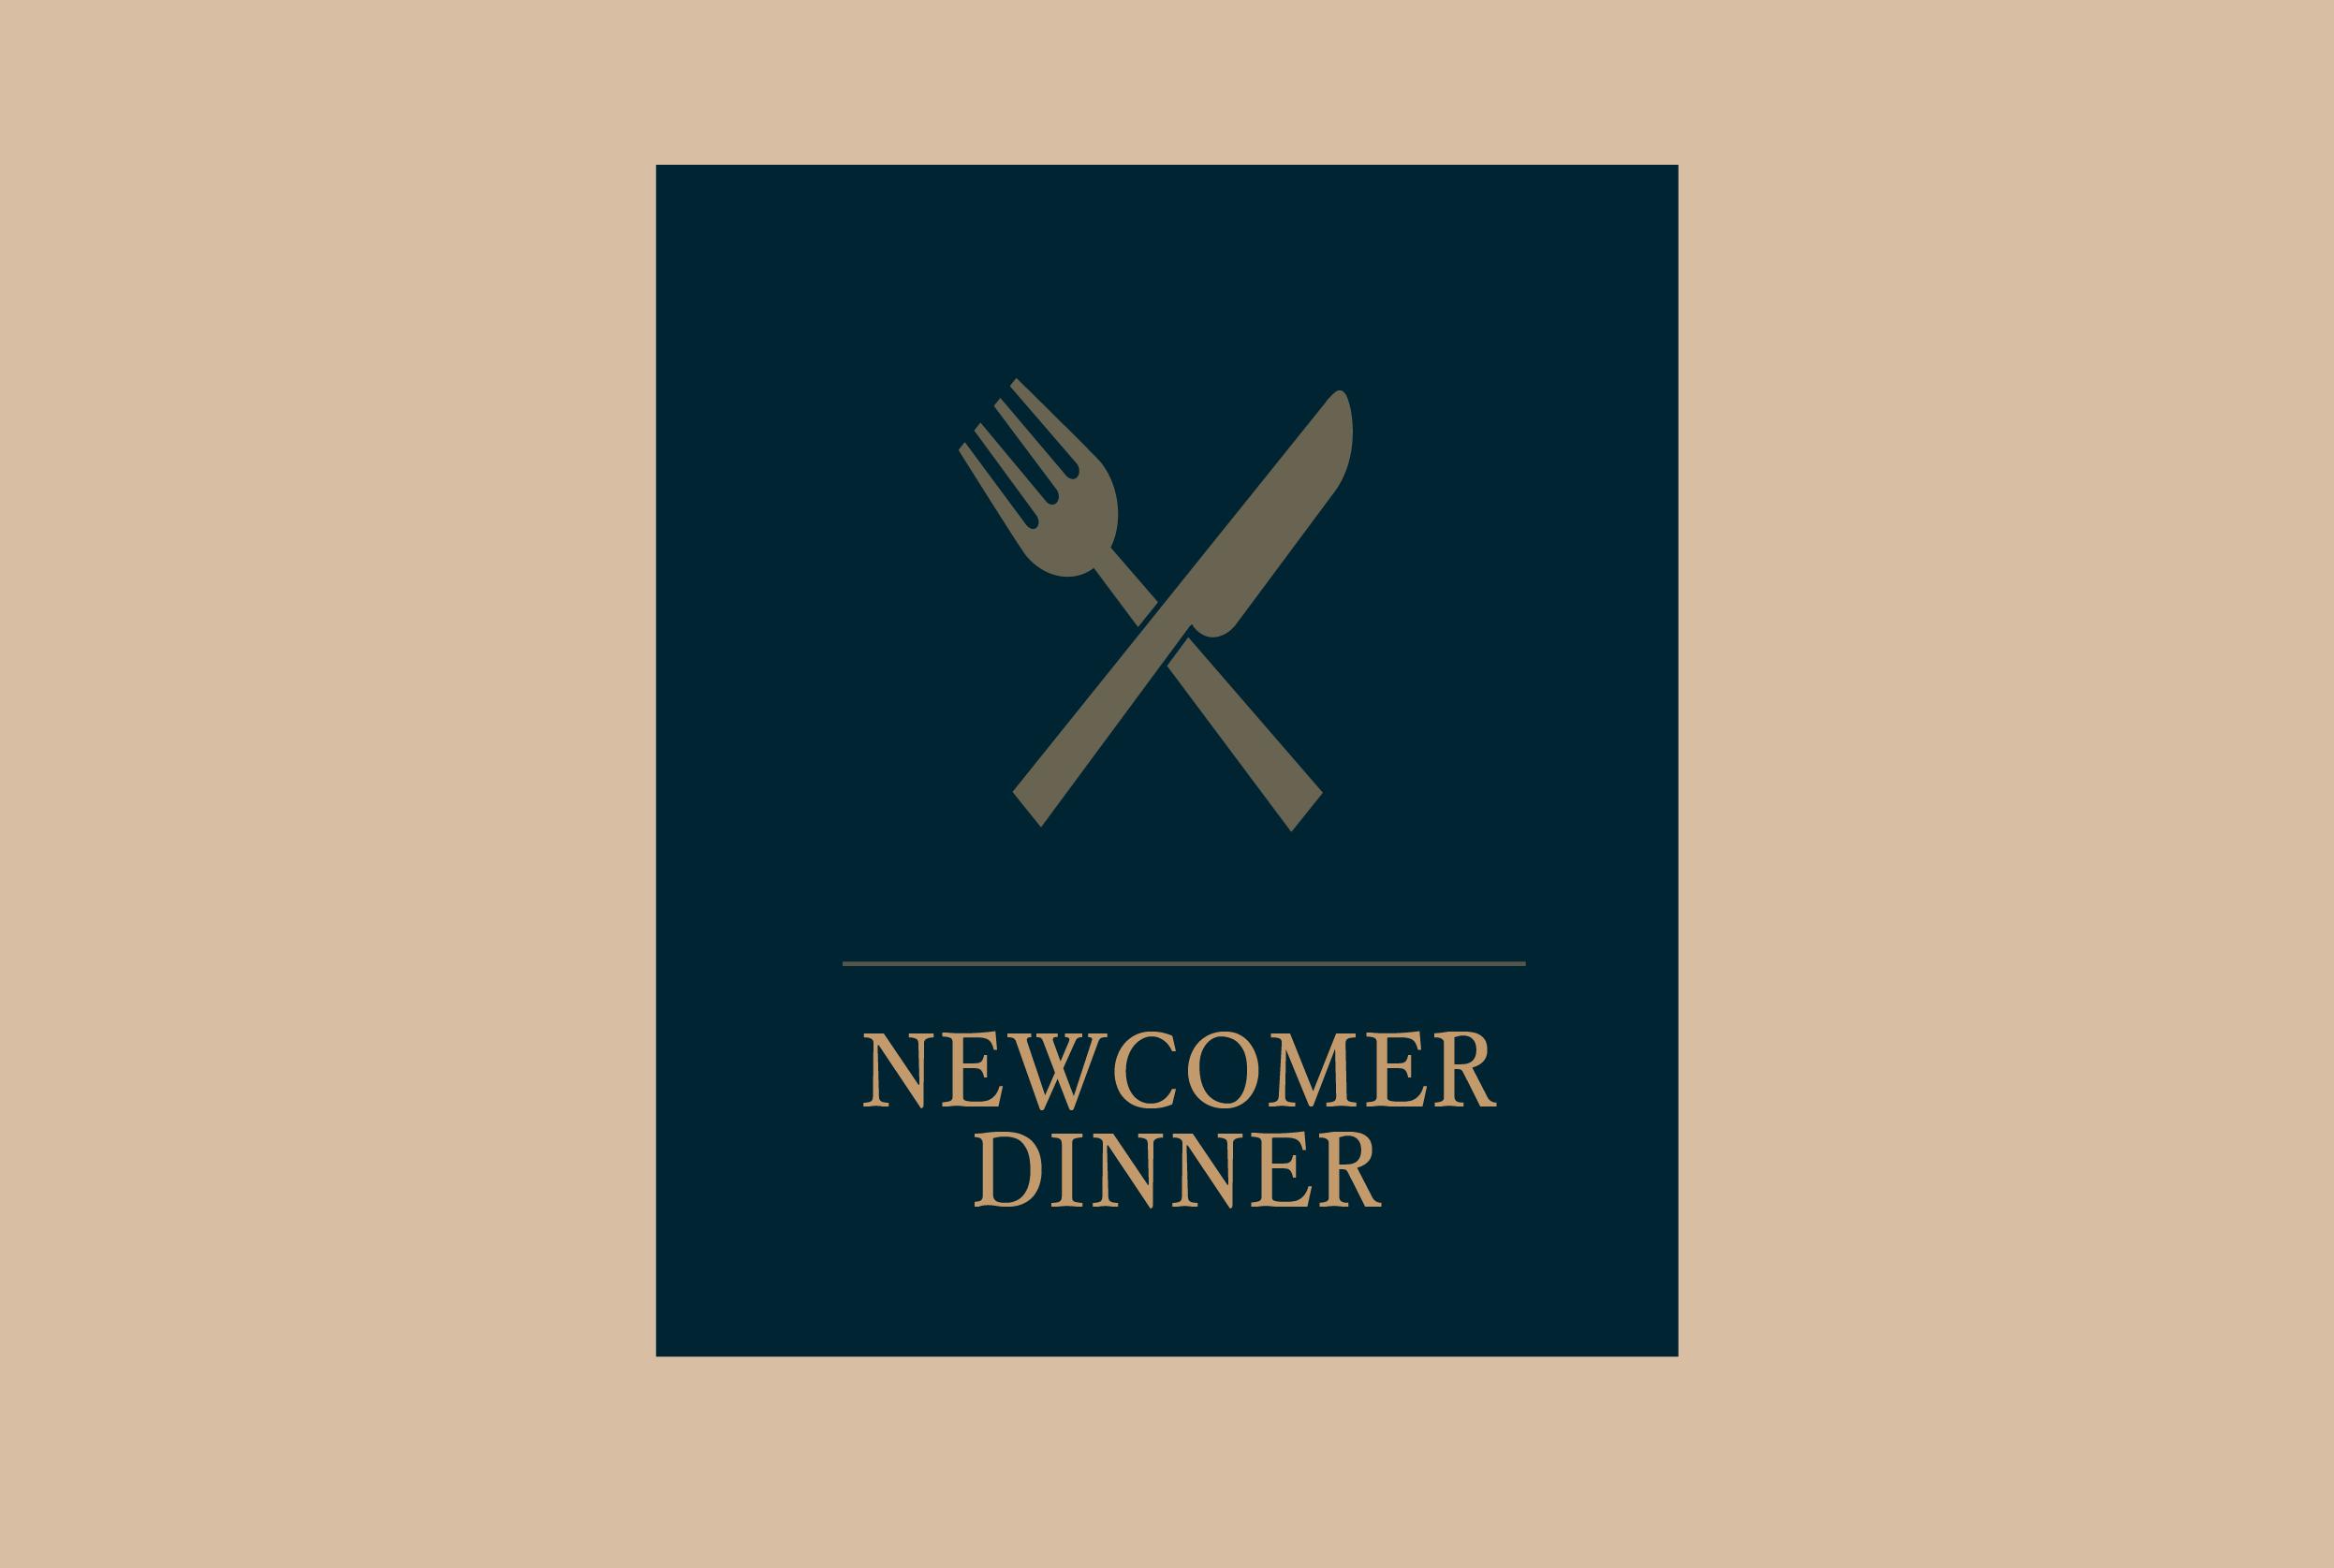 Newcomer dinner mailchimp tg 3 17